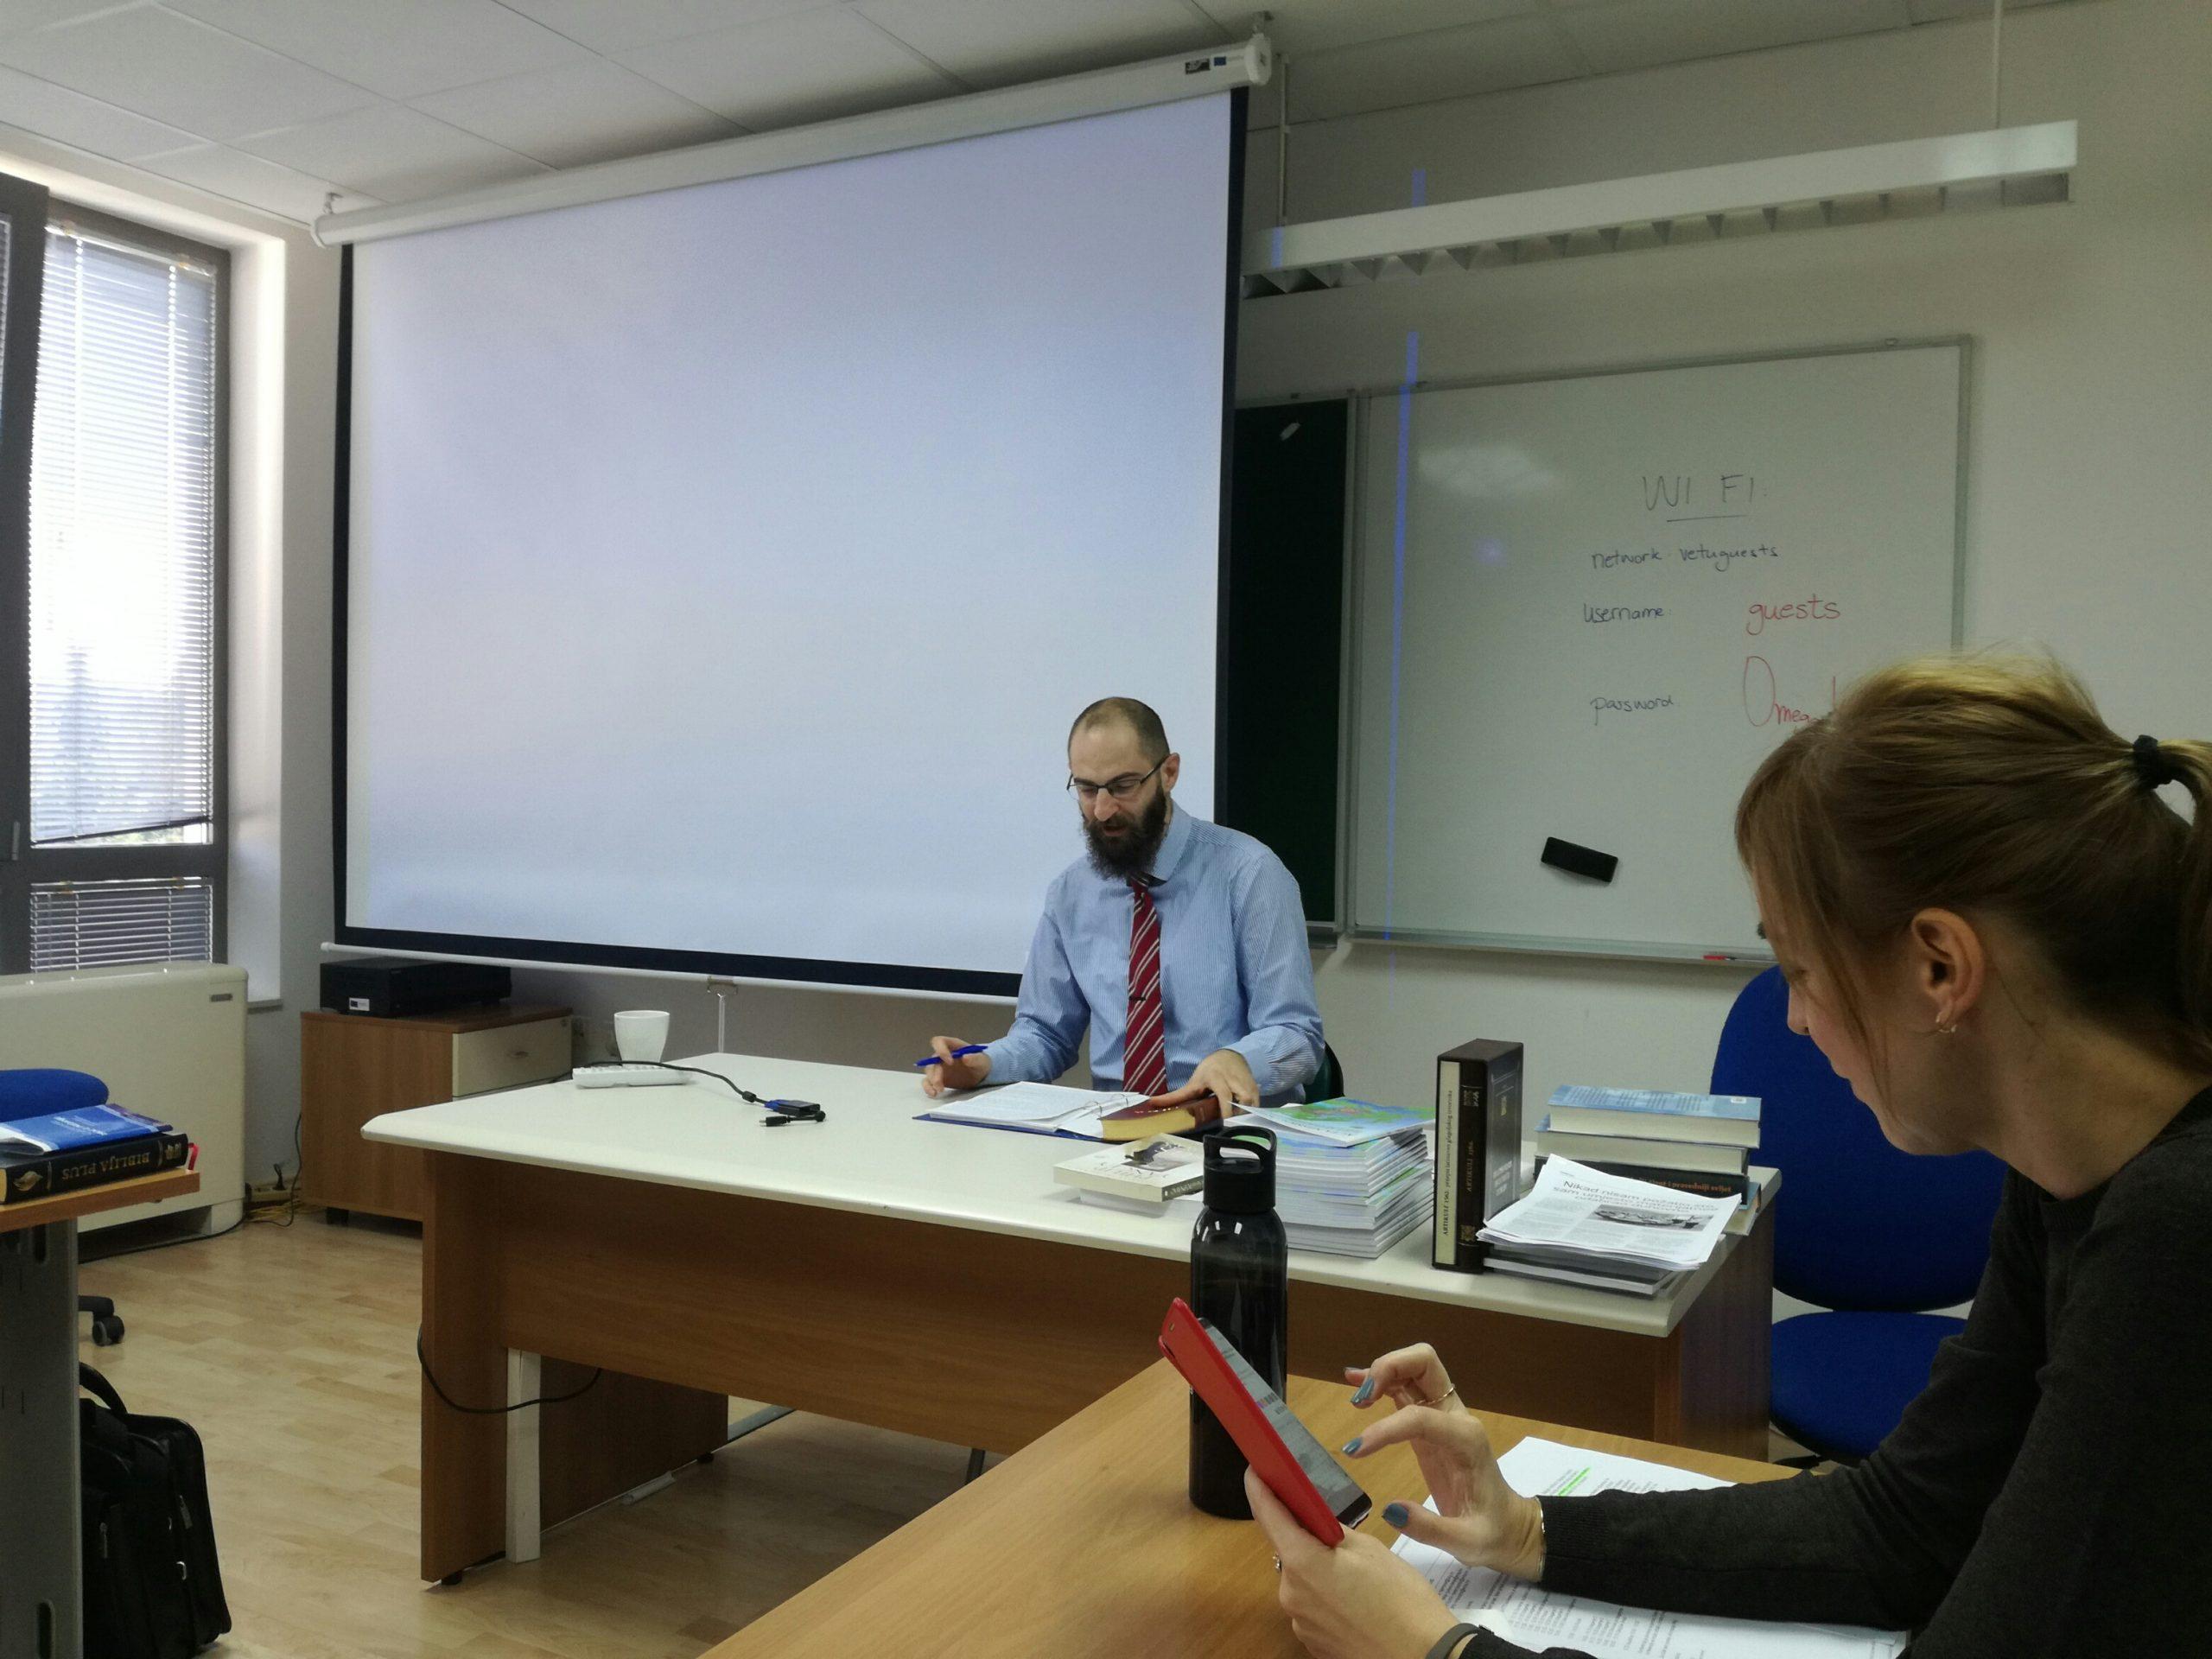 Matio Kushner ETD Osijek 26.10.19.